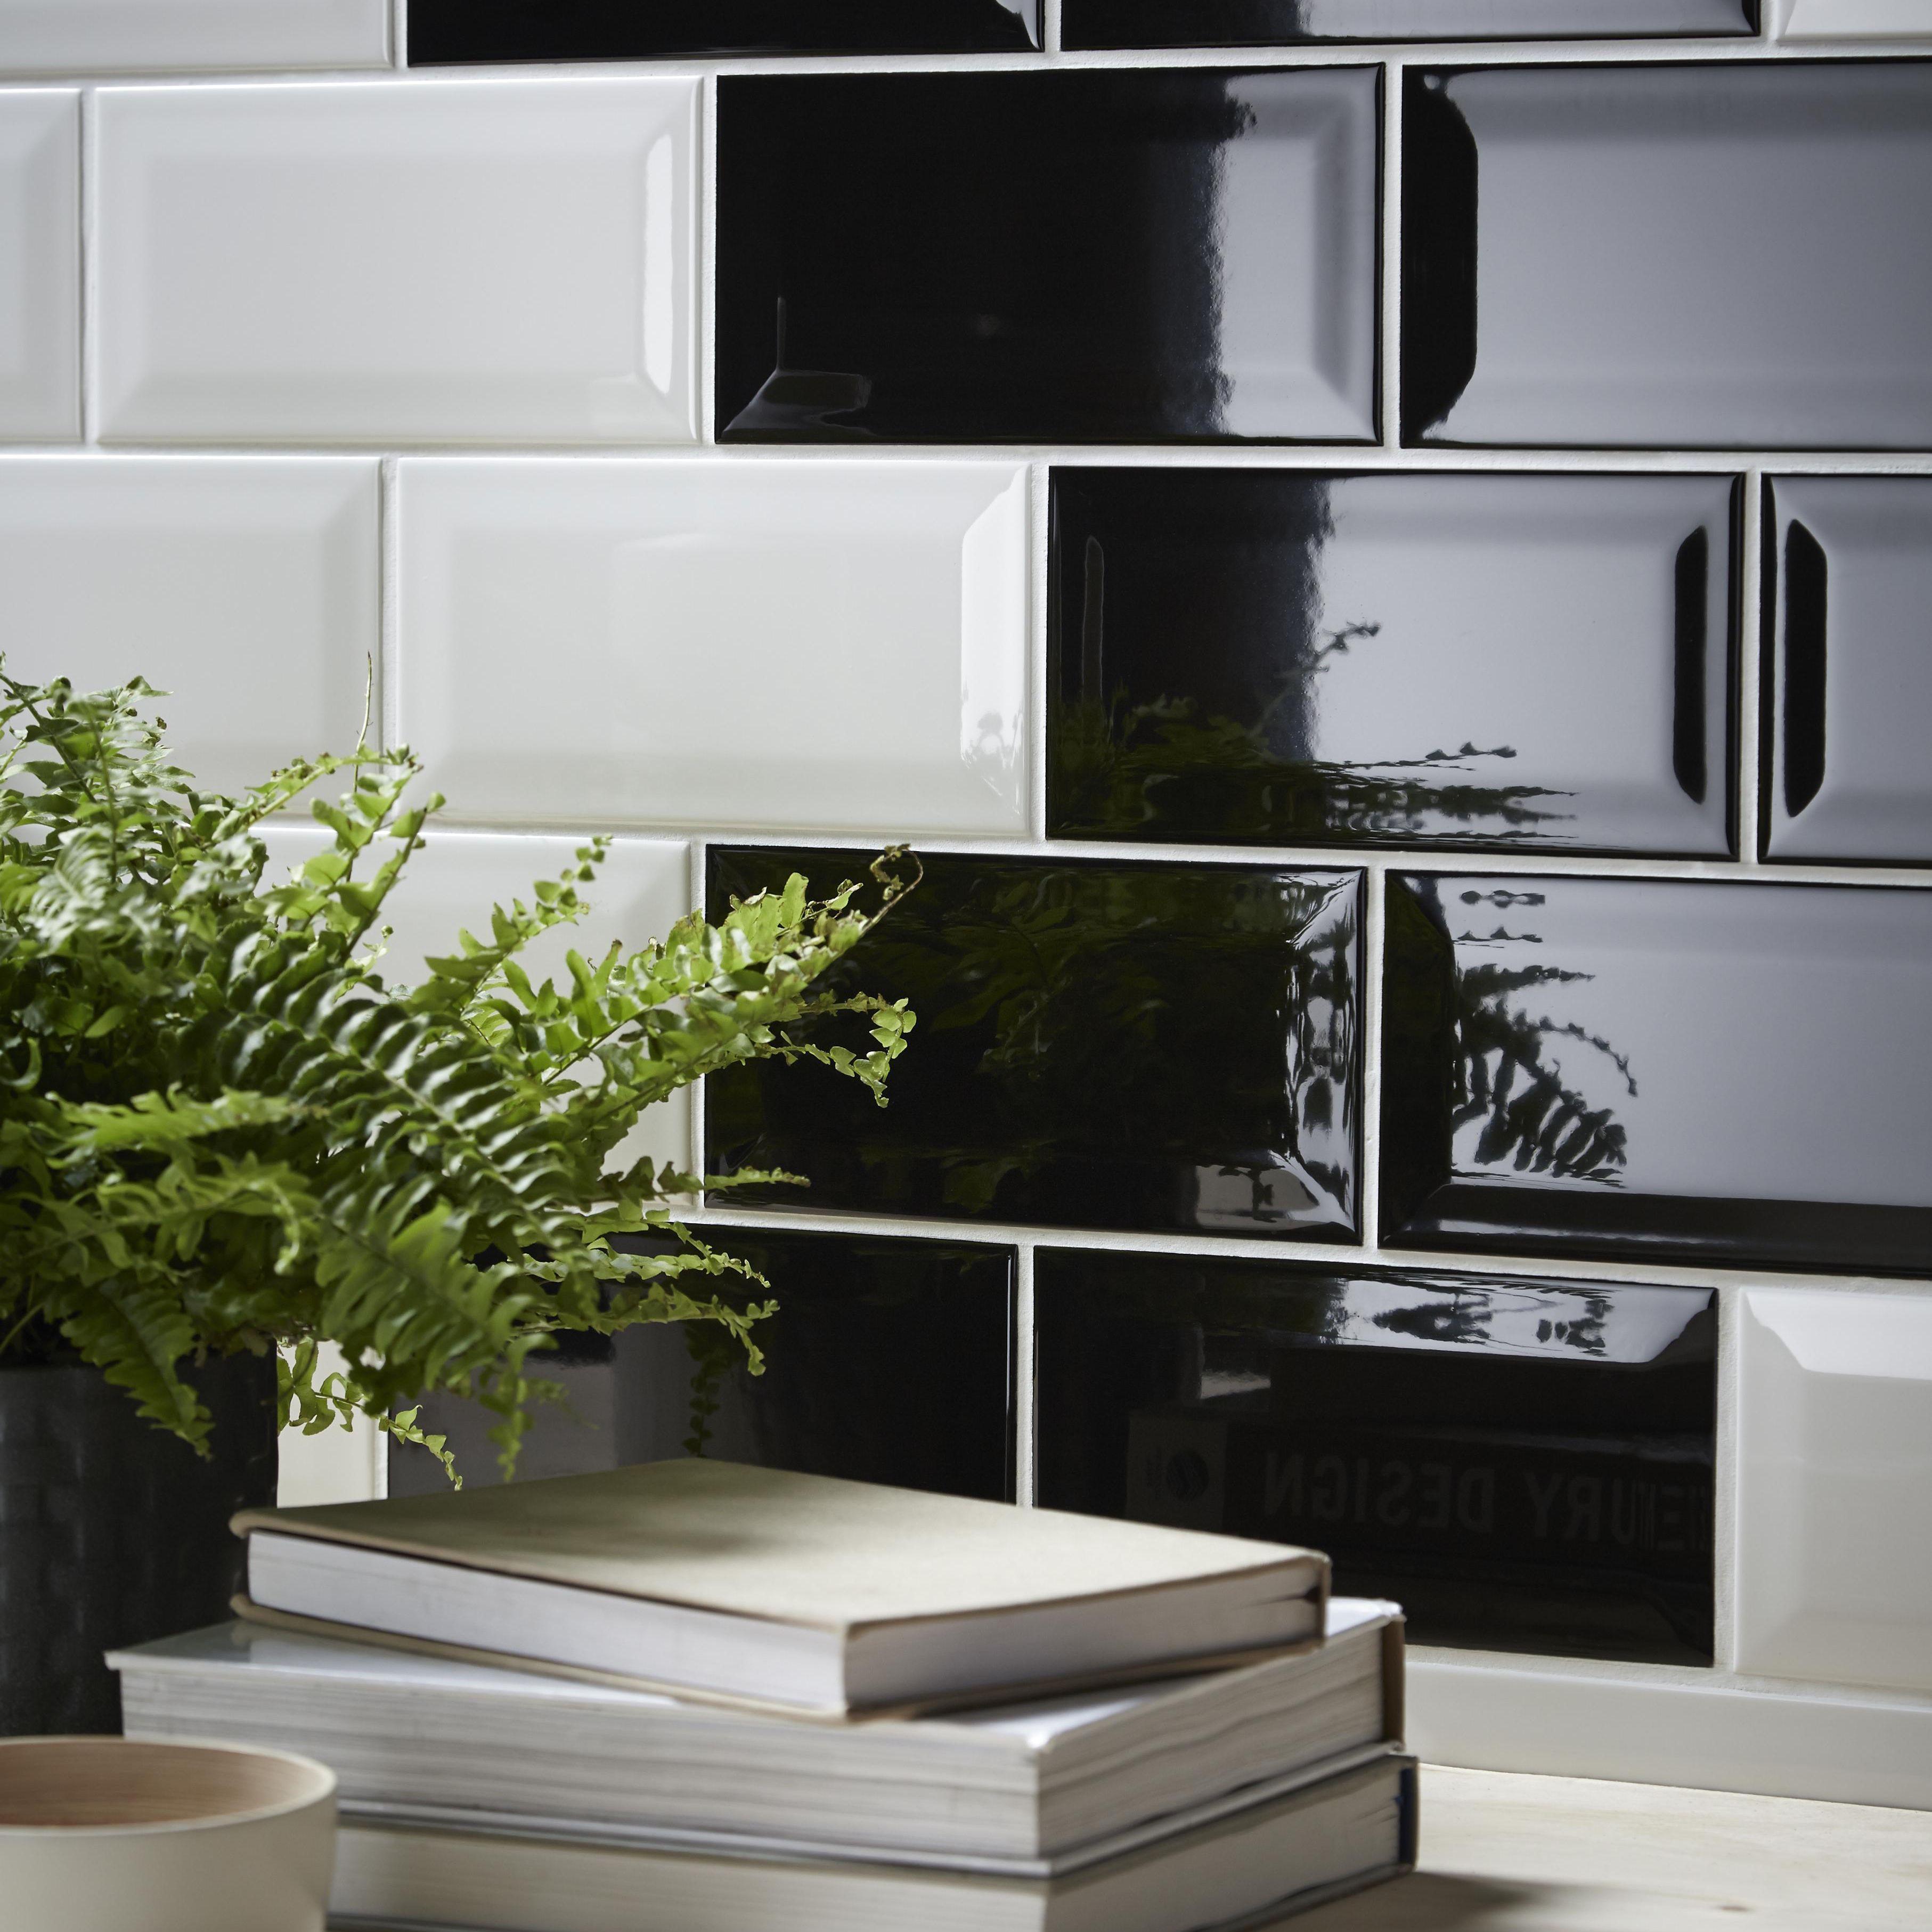 Kitchen Tiles B Q Bathroom Flooring B And Q Bathroom Floor Paint B Q. Bathroom  Tile Part 36